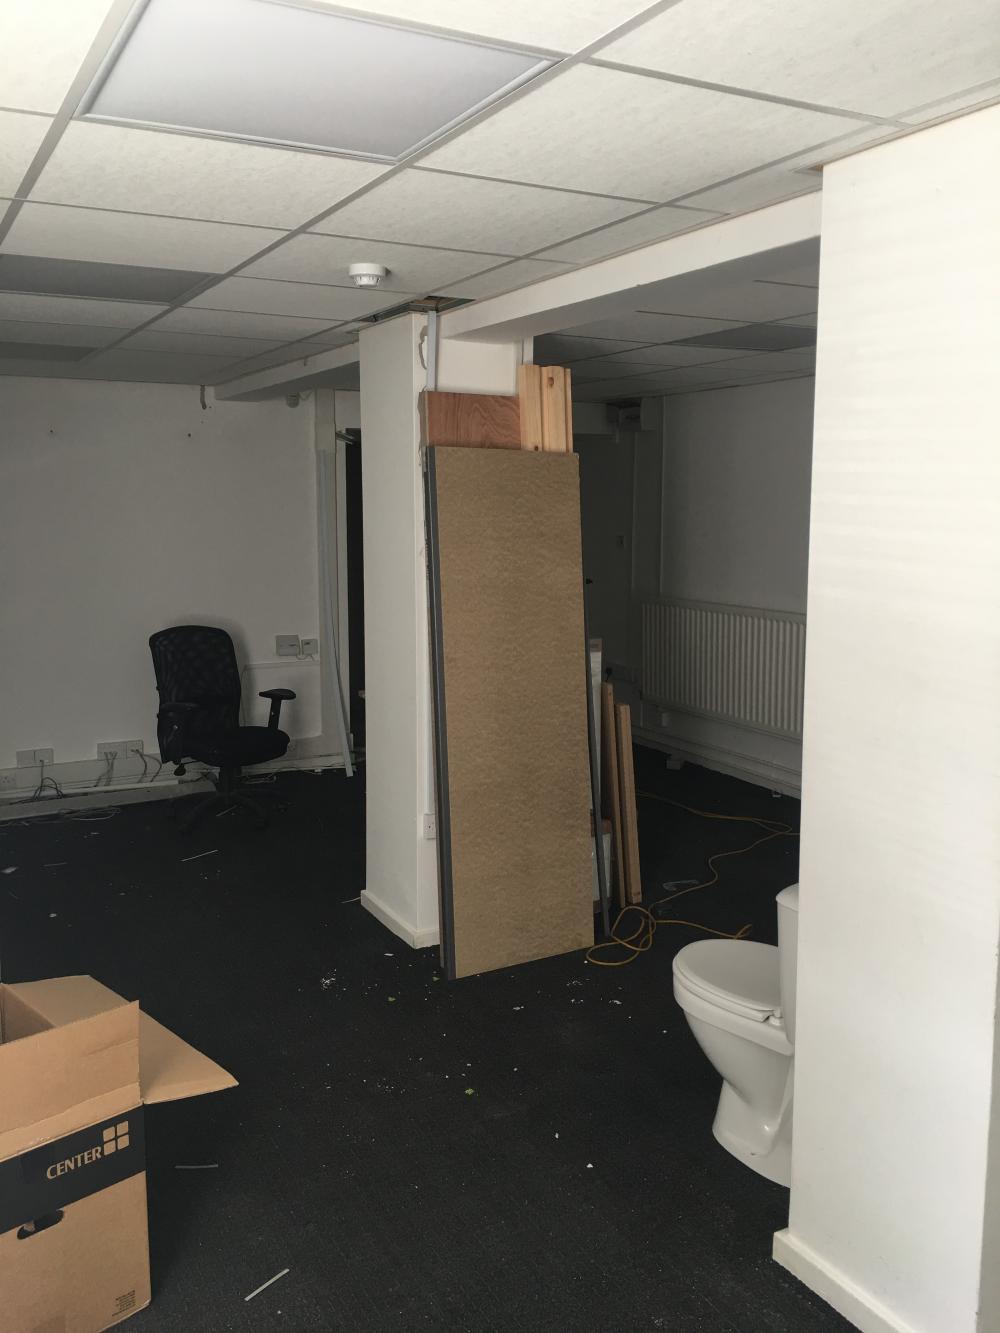 Unit 7, refurbish works in full swing